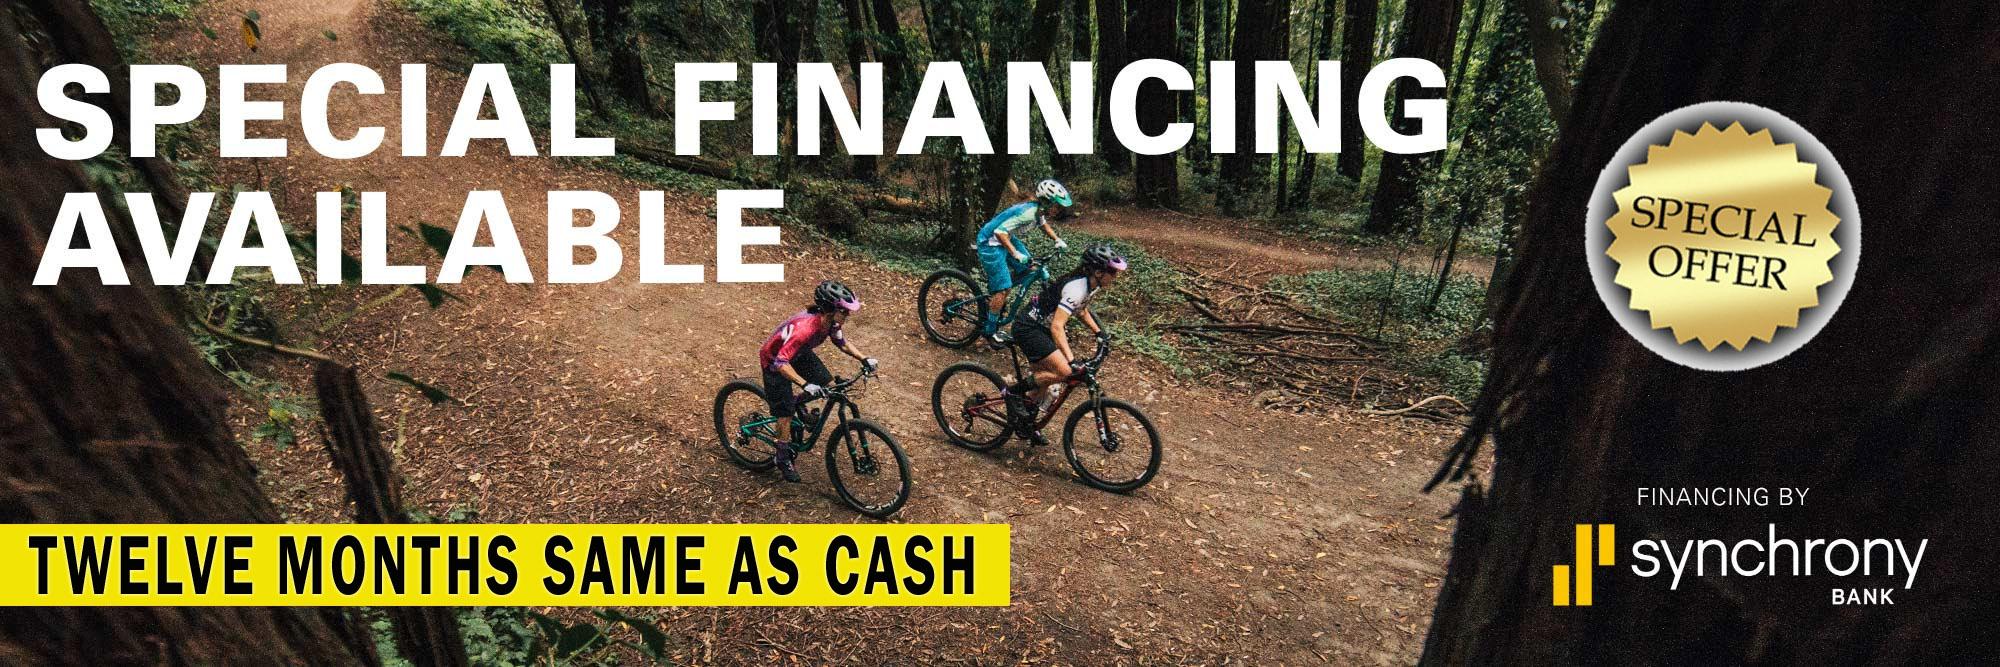 Financing - 12 Months Same as Cash